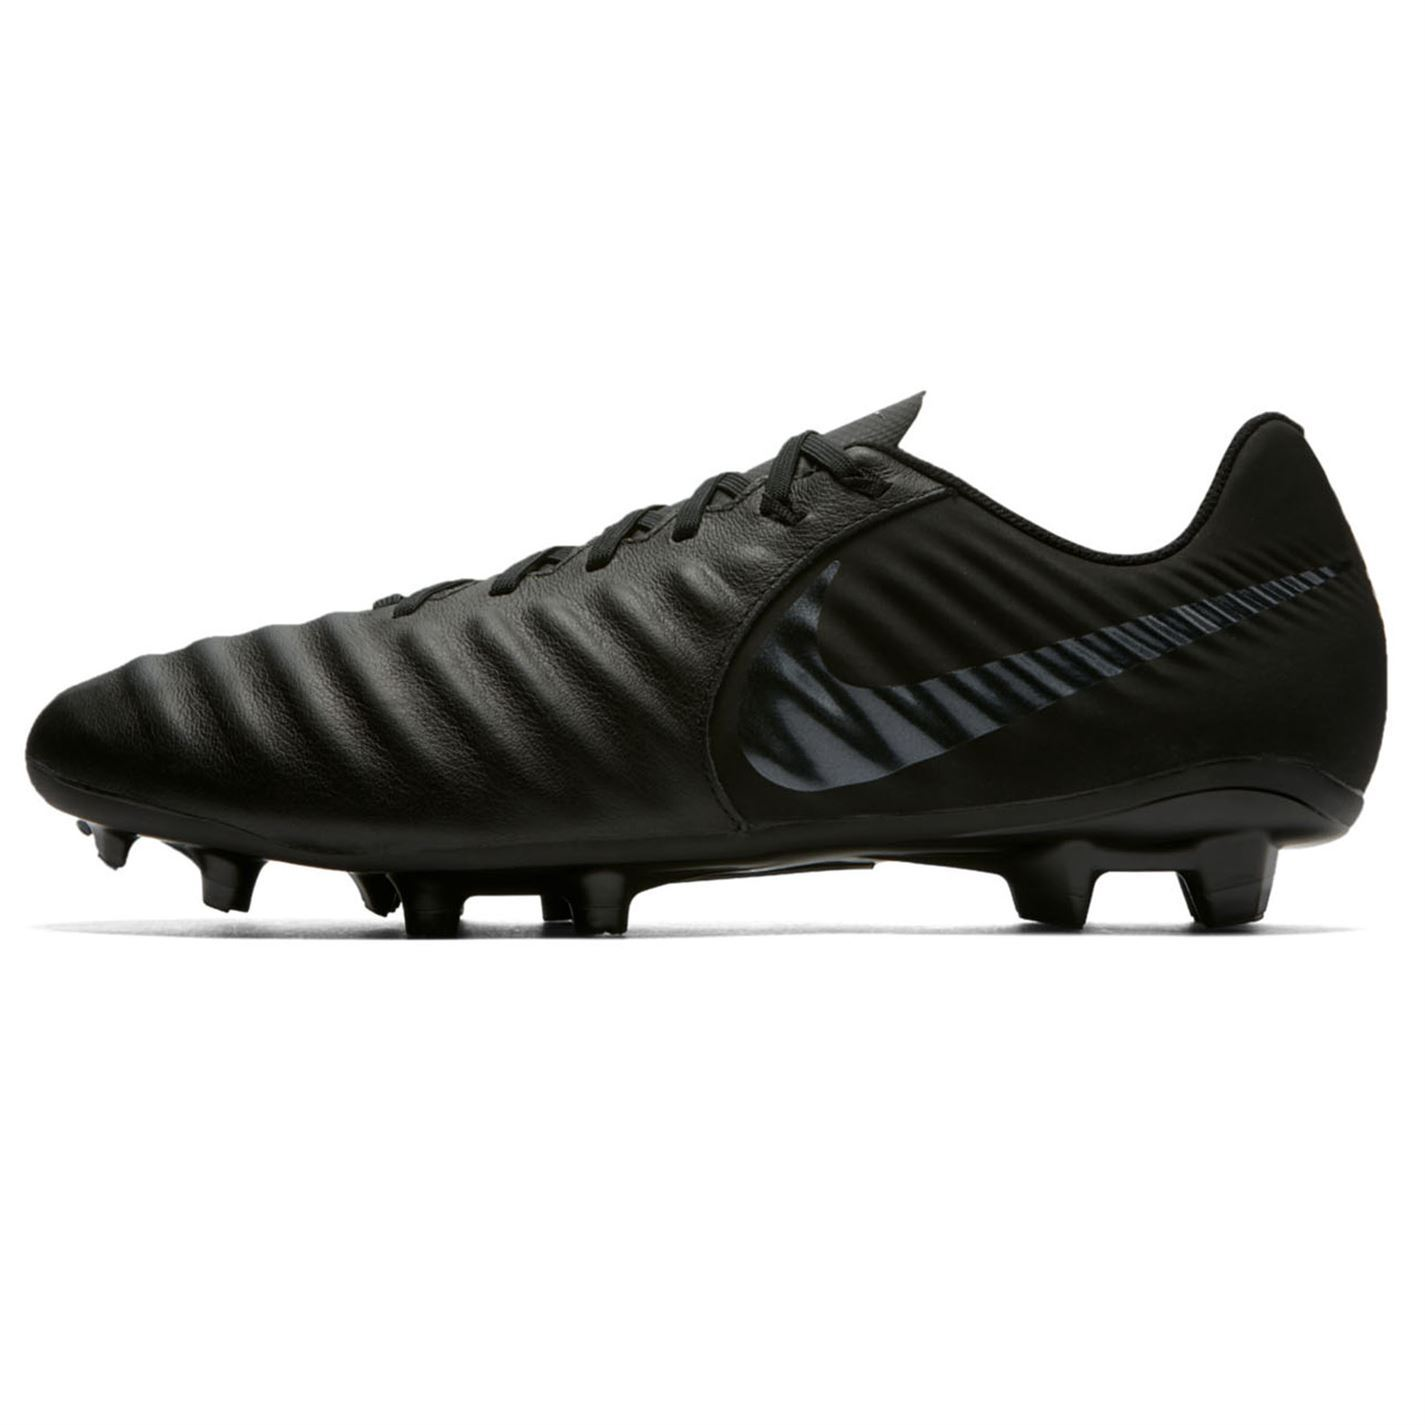 Nike-Tiempo-Legend-Academy-FG-Firm-Ground-Chaussures-De-Football-Homme-Football-Chaussures-Crampons miniature 11